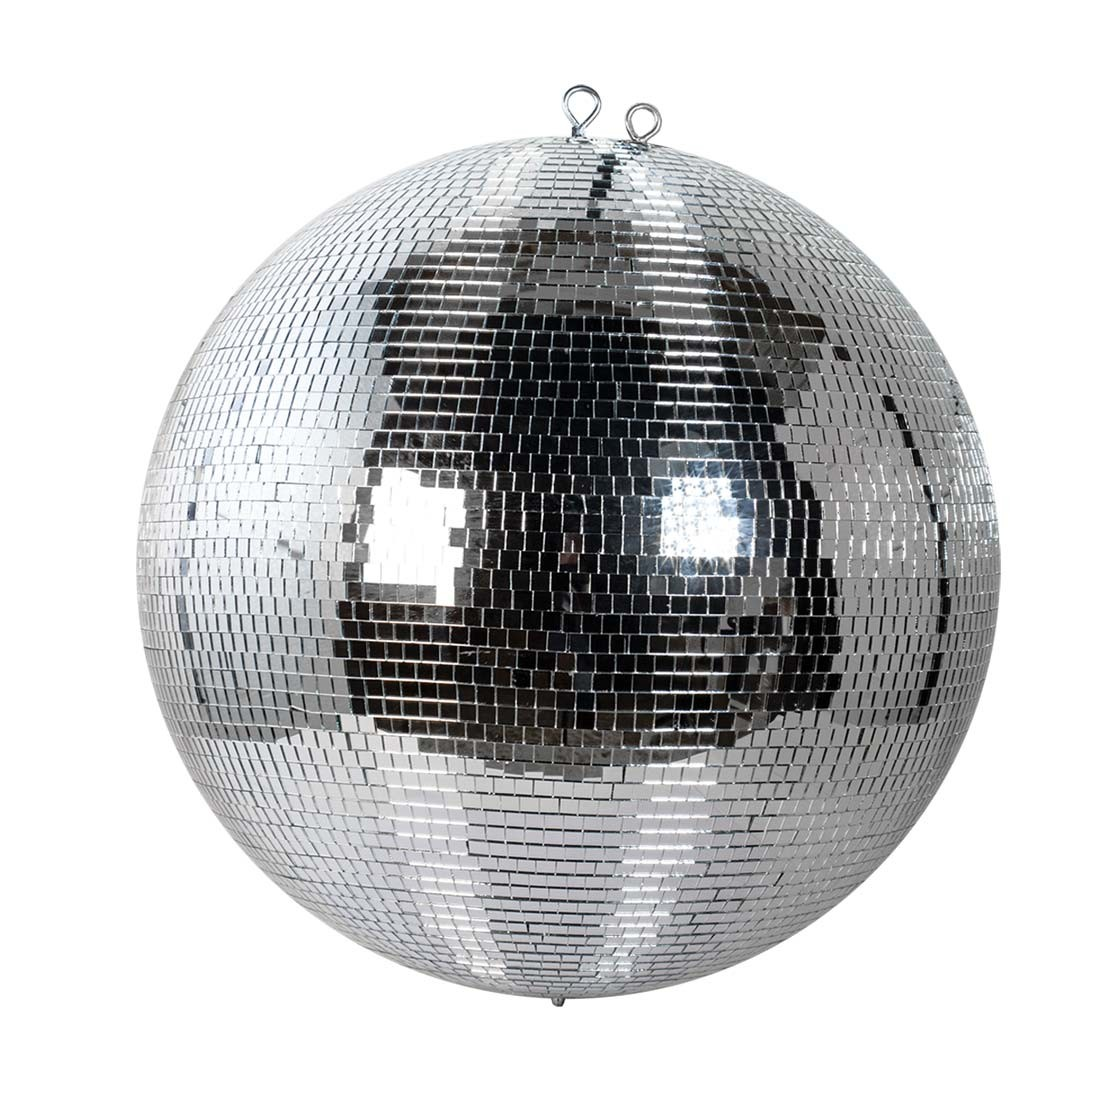 Mirrorball 50 Cm M 2020 Mirrorballs Lights Products